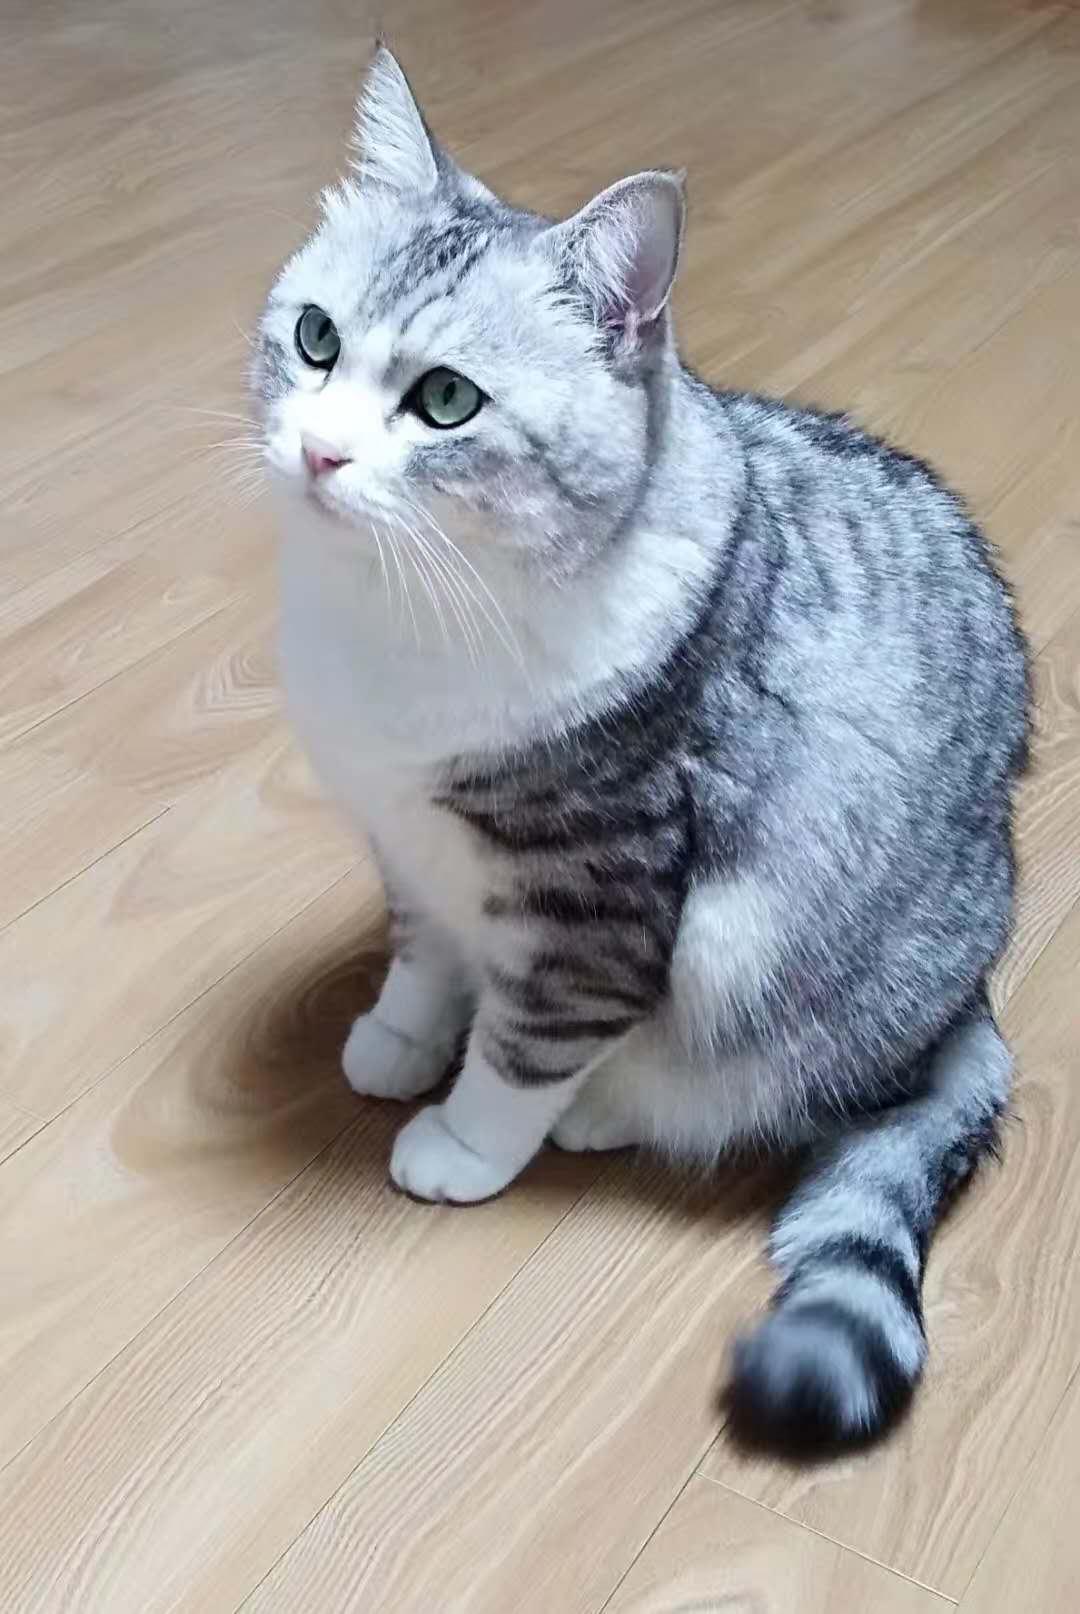 cgwell猫尾巴又来了 - MAYA建模插件-安装和启动说明 GIF动图分享13 作者:海外CG人才猎头 帖子ID:89444